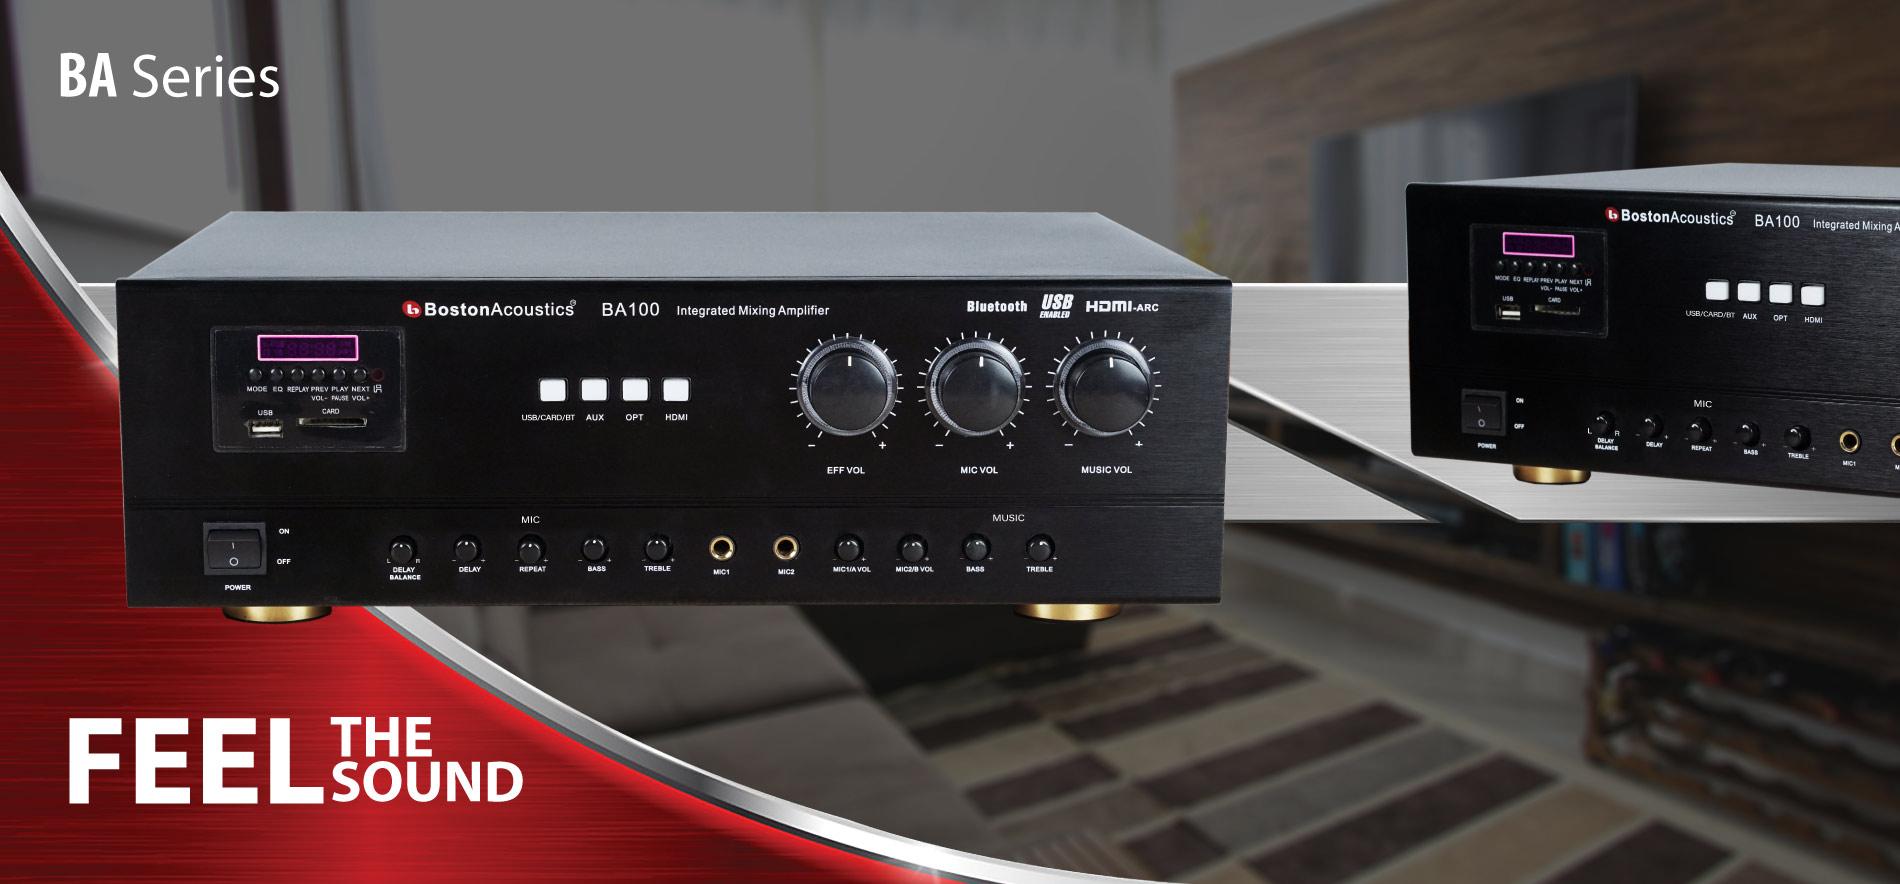 Boston Acoustics BA100 series